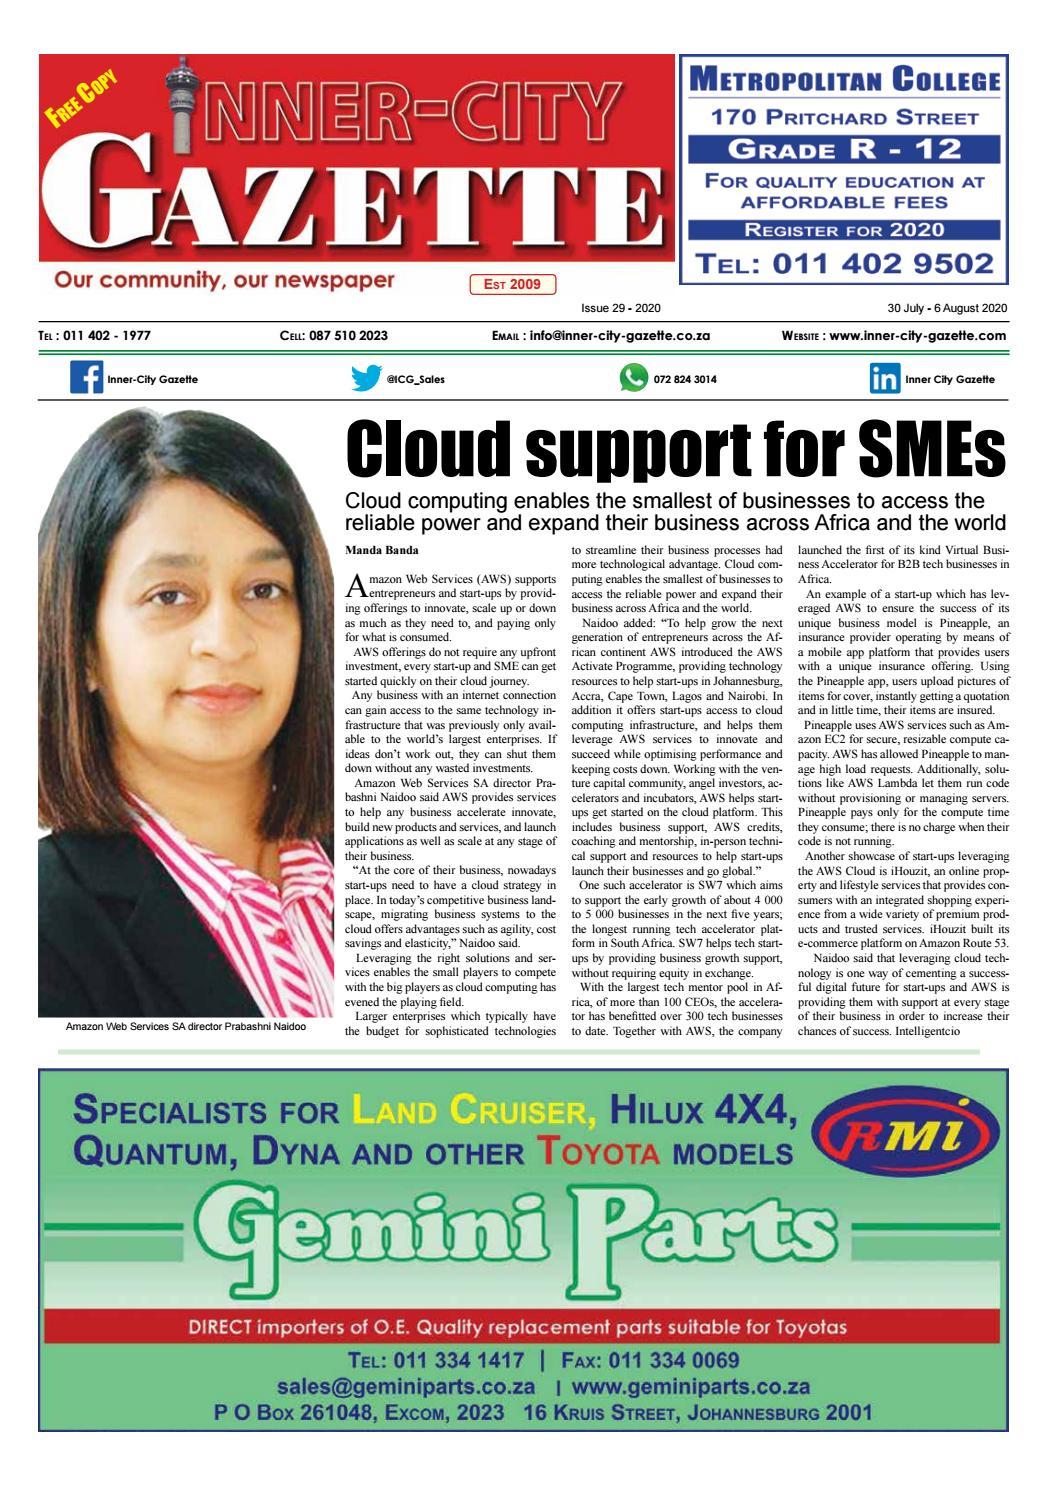 imbawula investment news